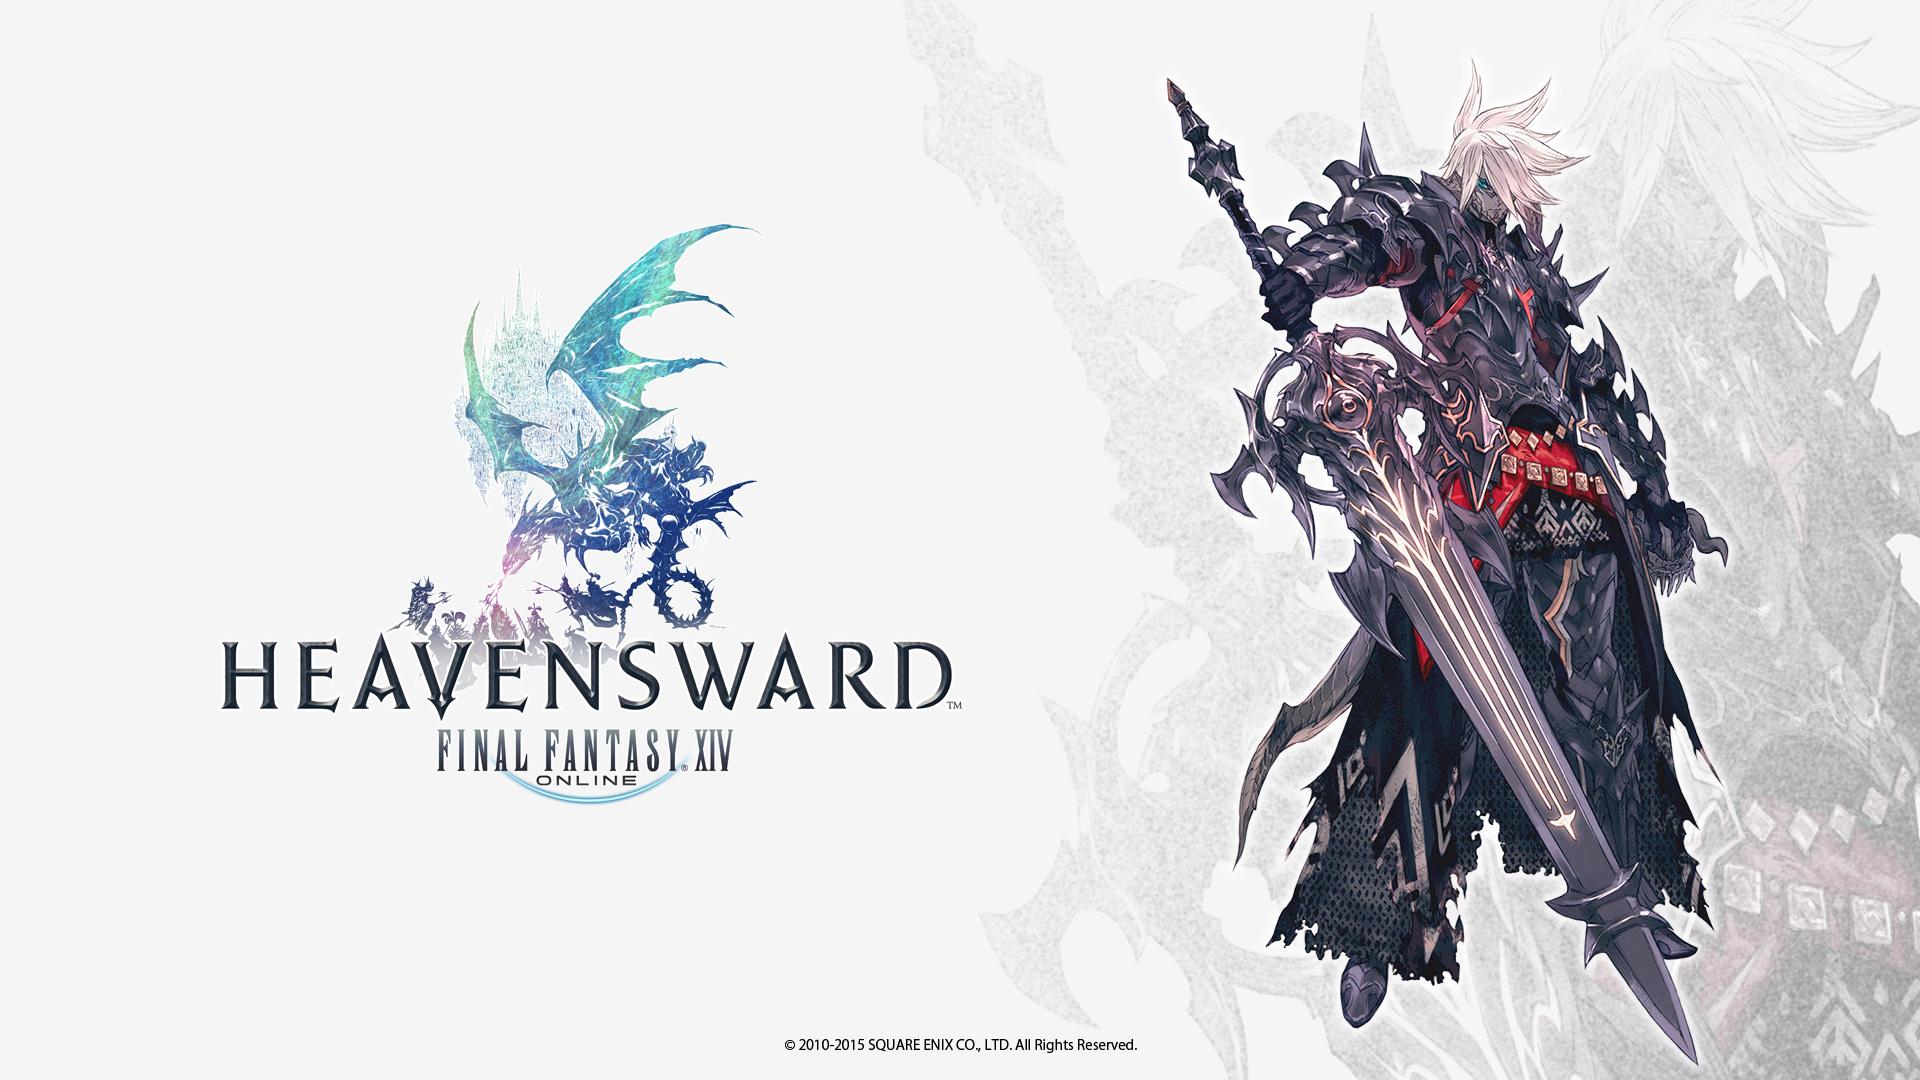 Final Fantasy Xiv Wallpaper 091 Wallpapers Ethereal Games